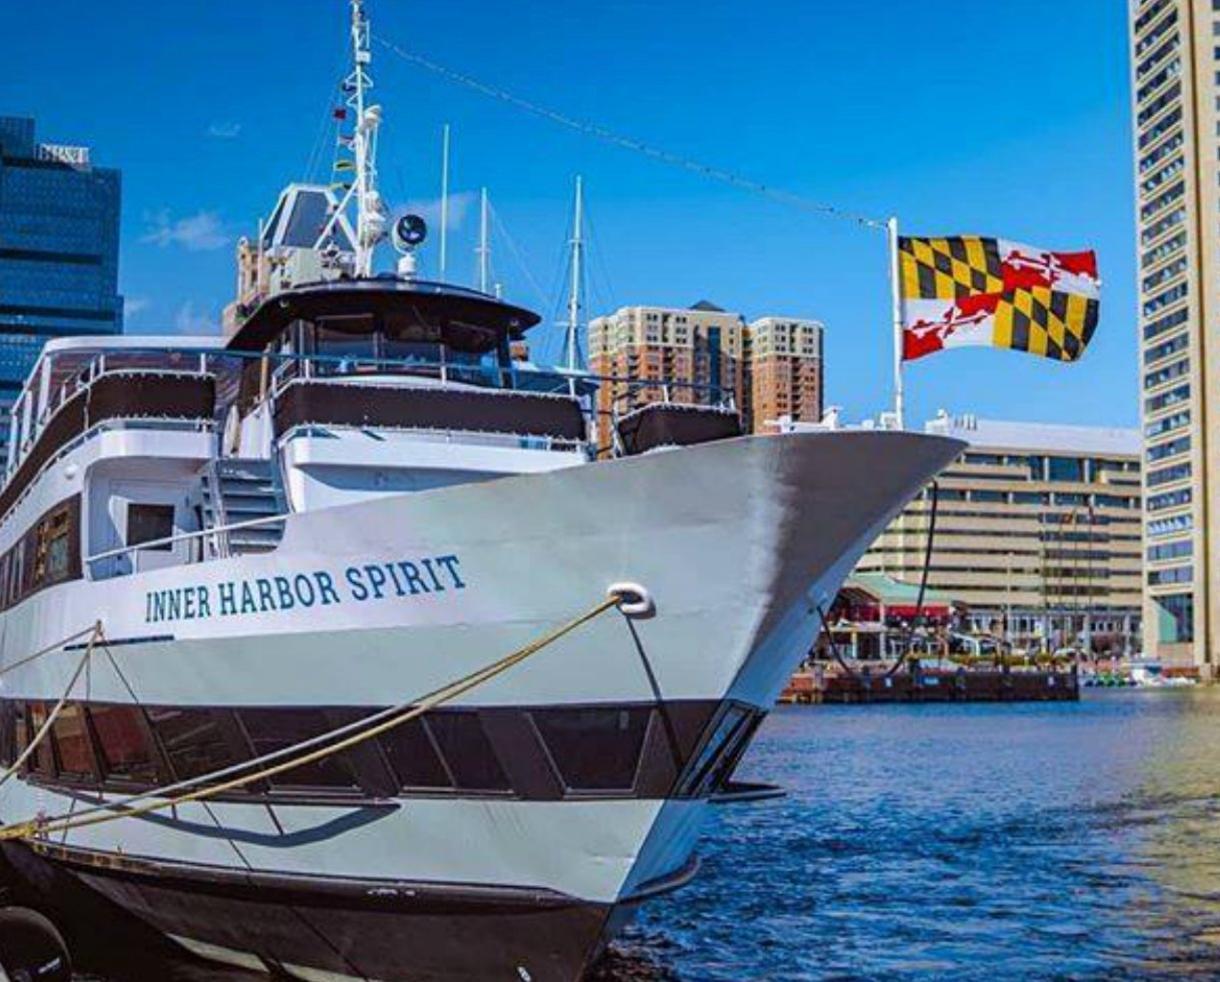 Baltimore's Inner Harbor Sightseeing Tour on Spirit Cruises